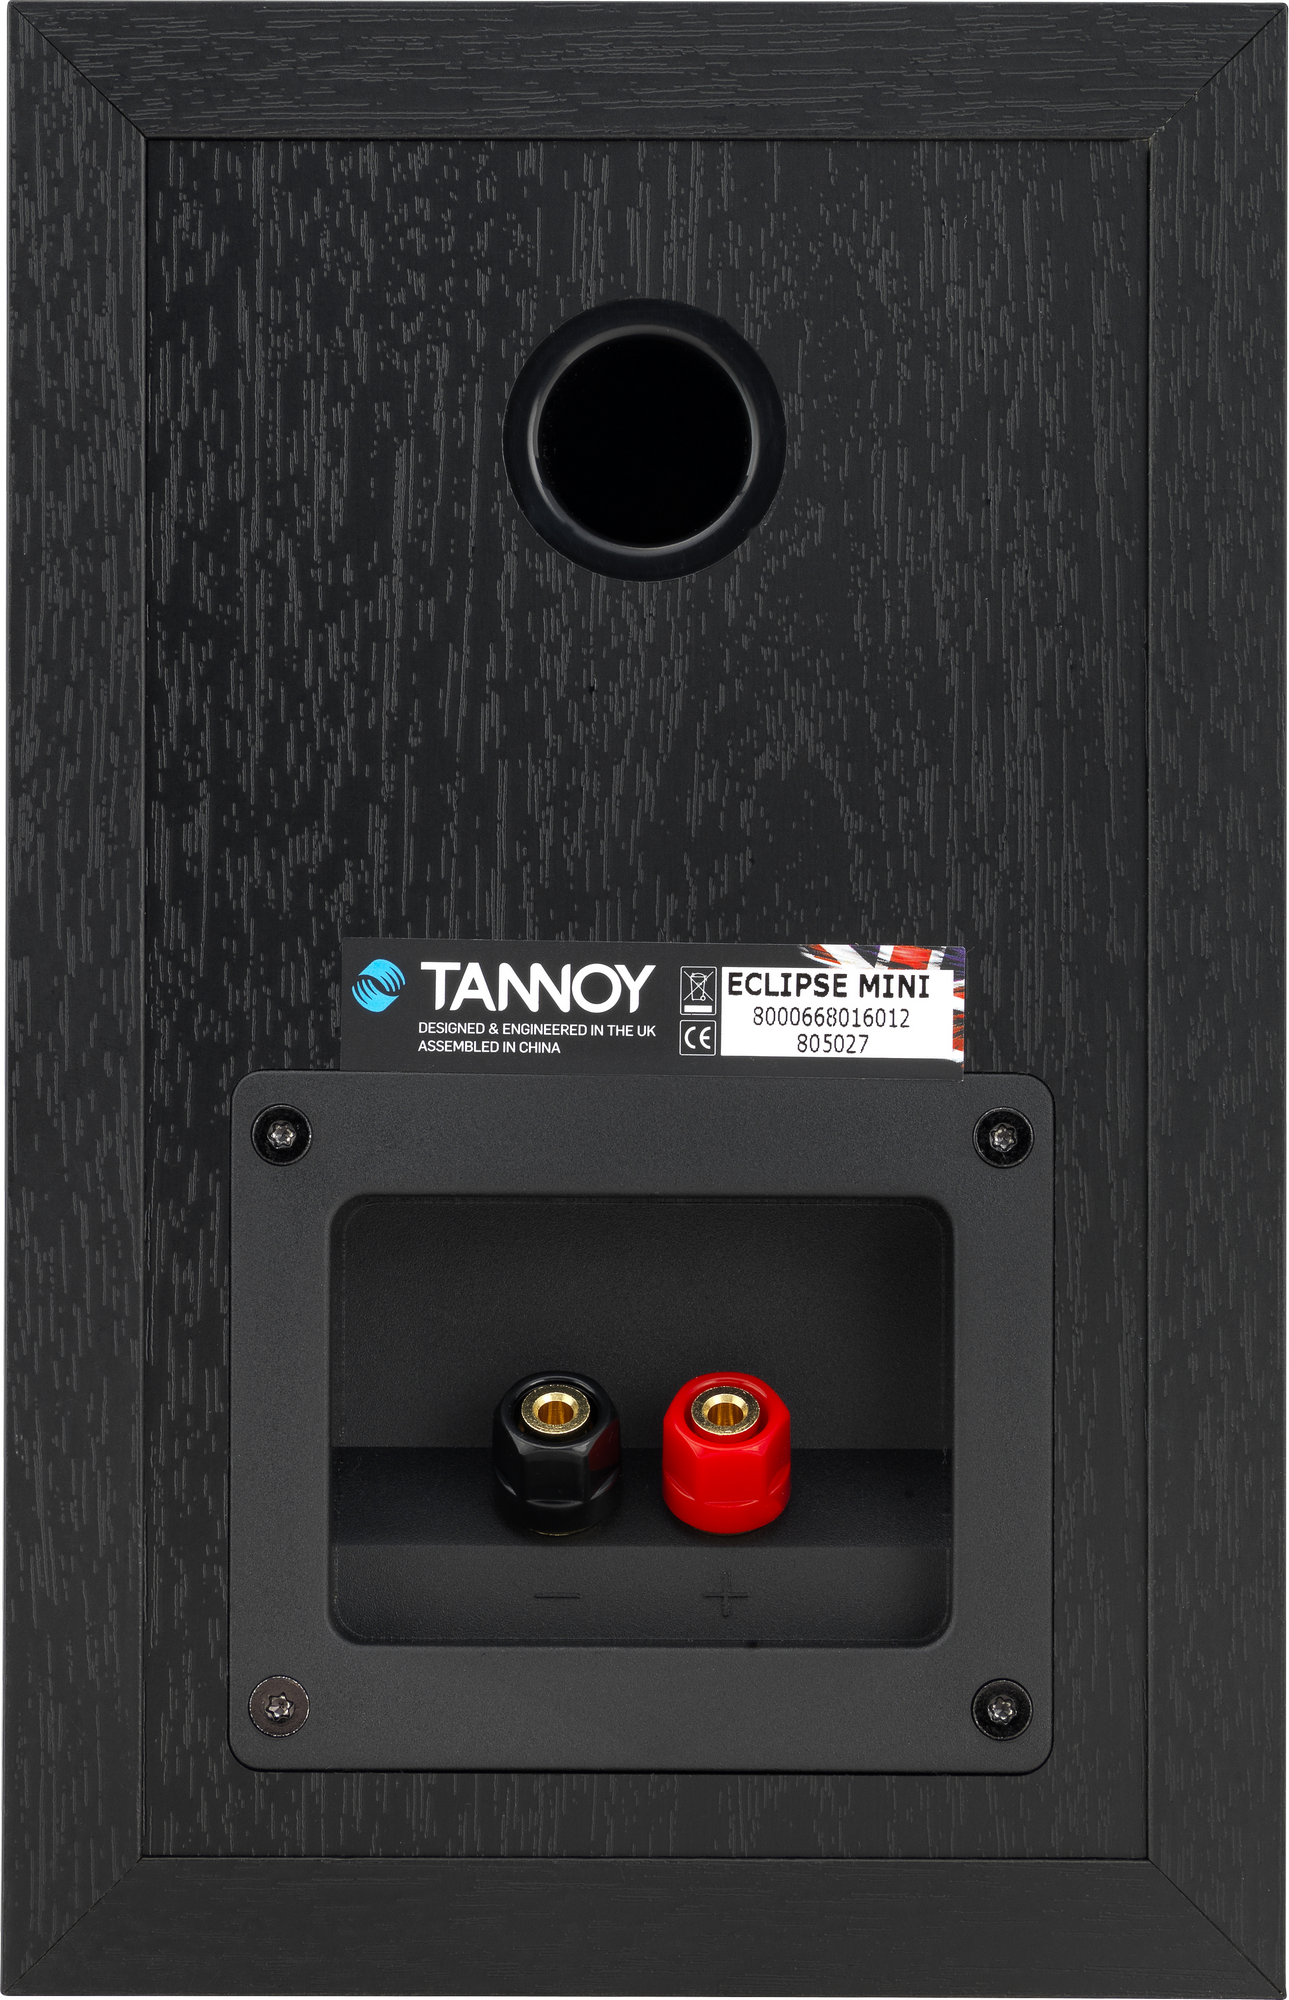 Tannoy  ECLIPSE MINI BLACK OAK - Home Theater speaker